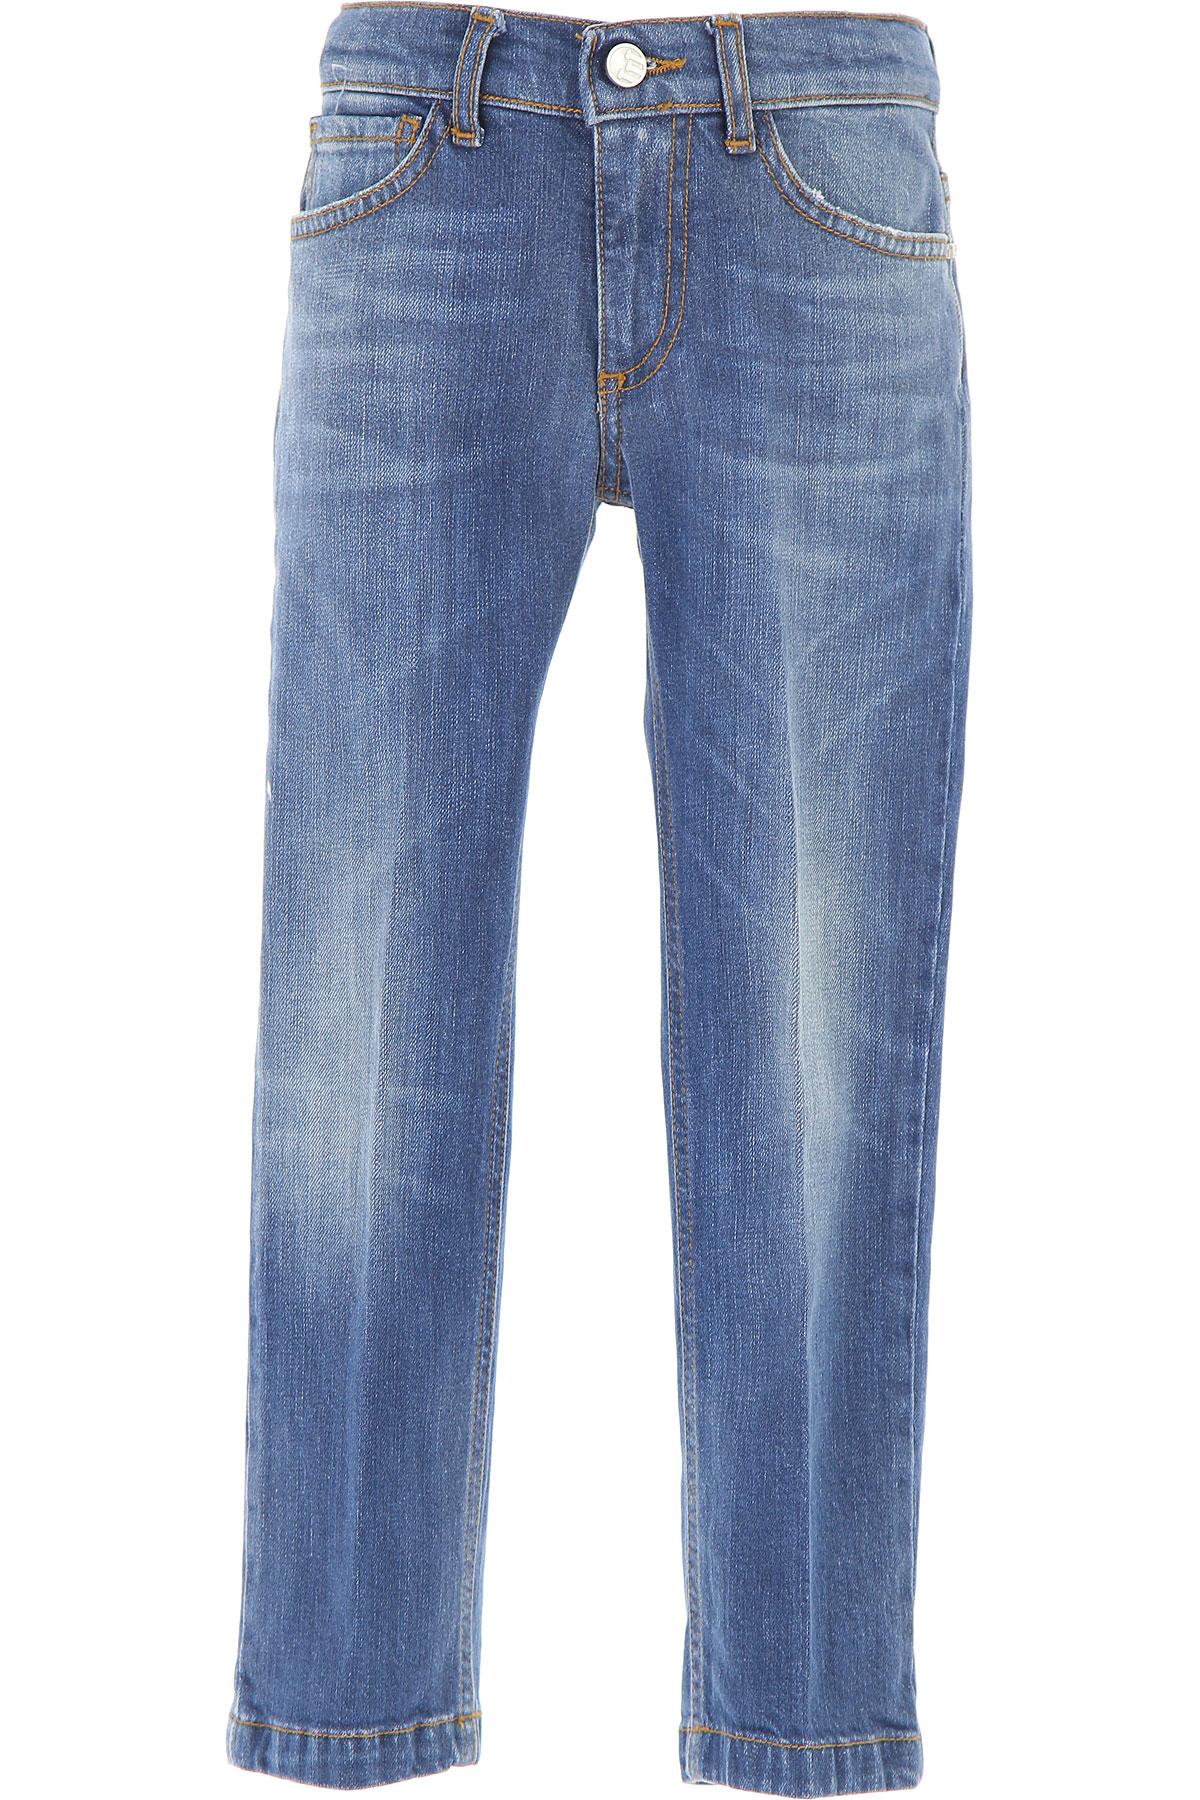 Image of Entre Amis Kids Jeans for Boys, Blue Denim, Cotton, 2017, 10Y 6Y